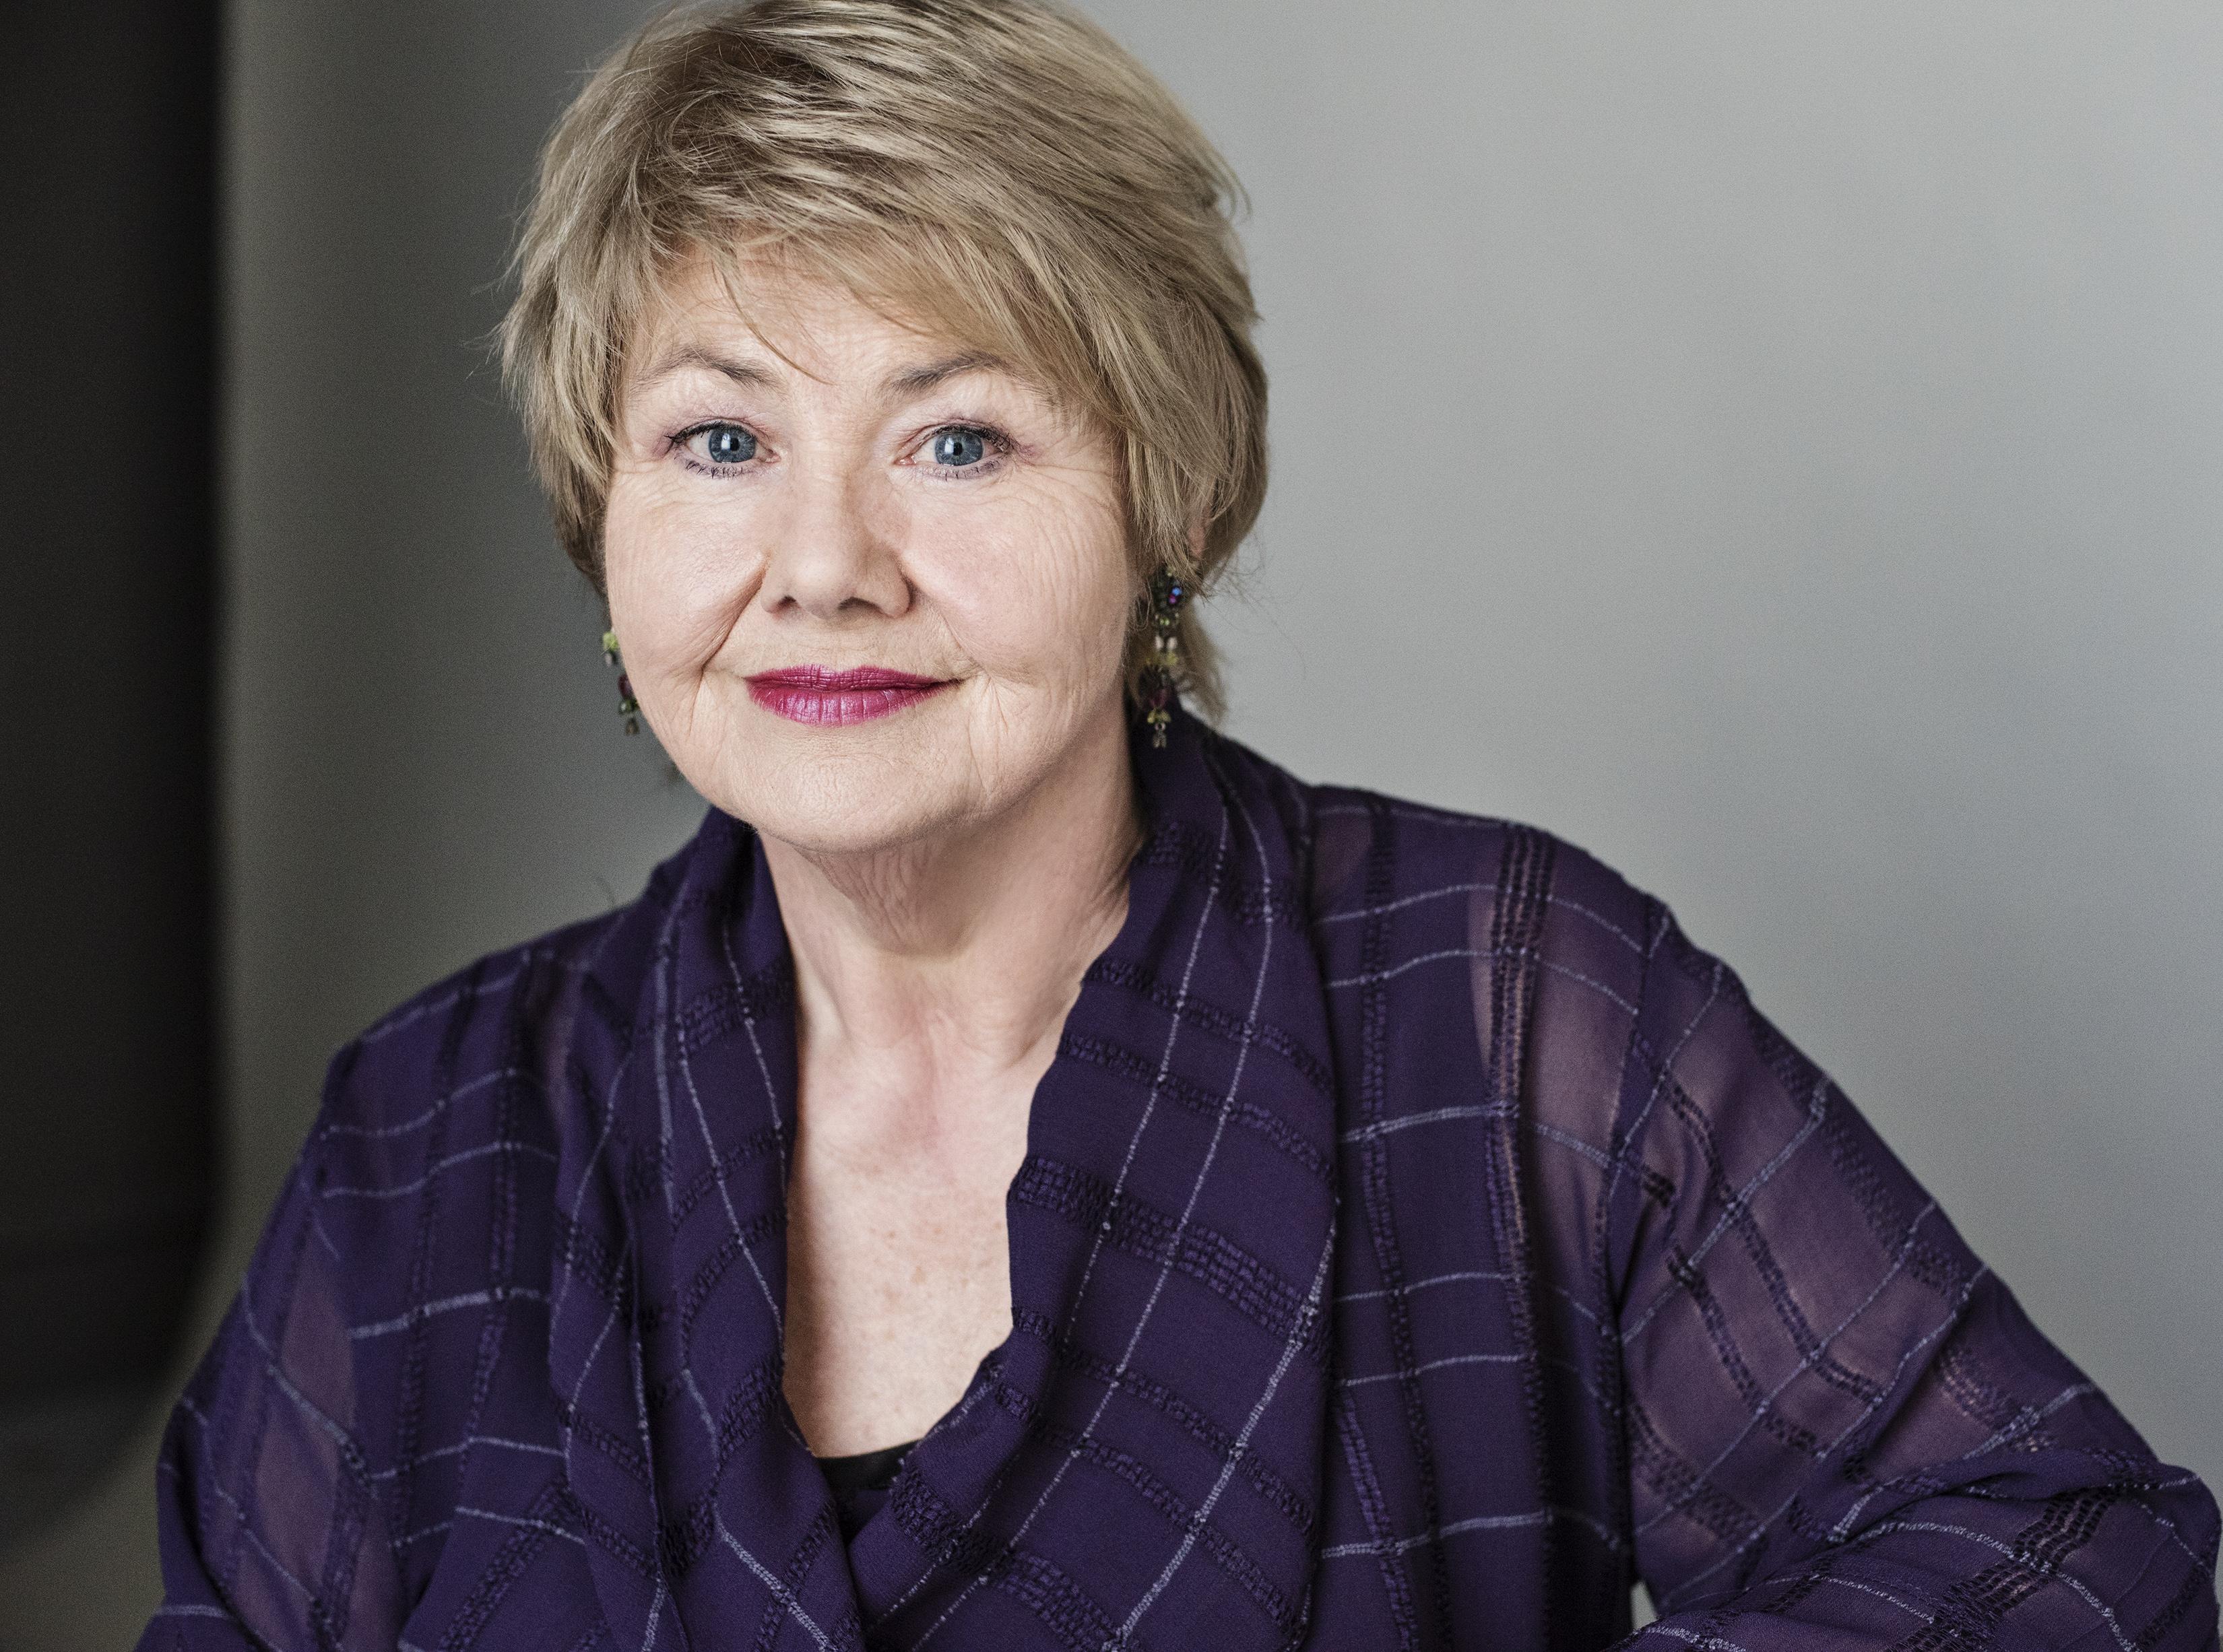 Annette Badland Imdb